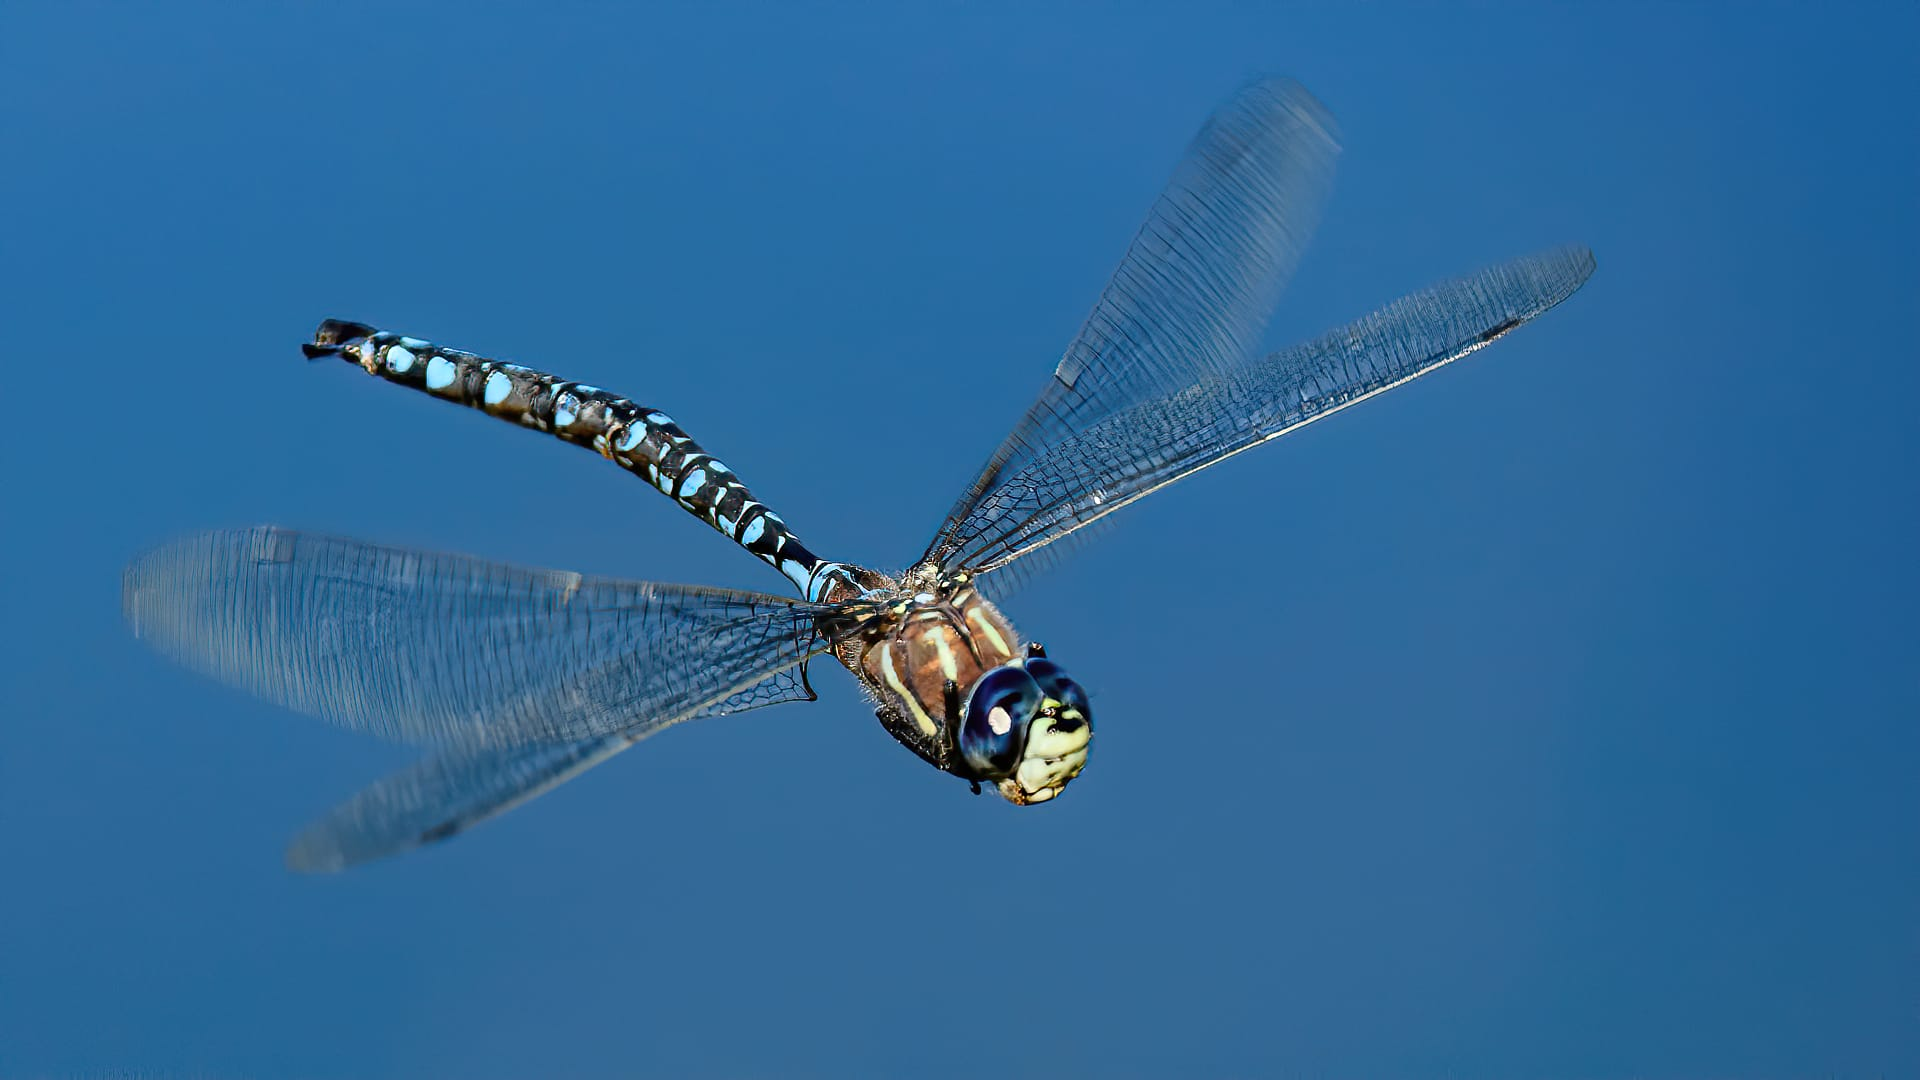 Dragonfly Flight Shot Strong Motion Blur